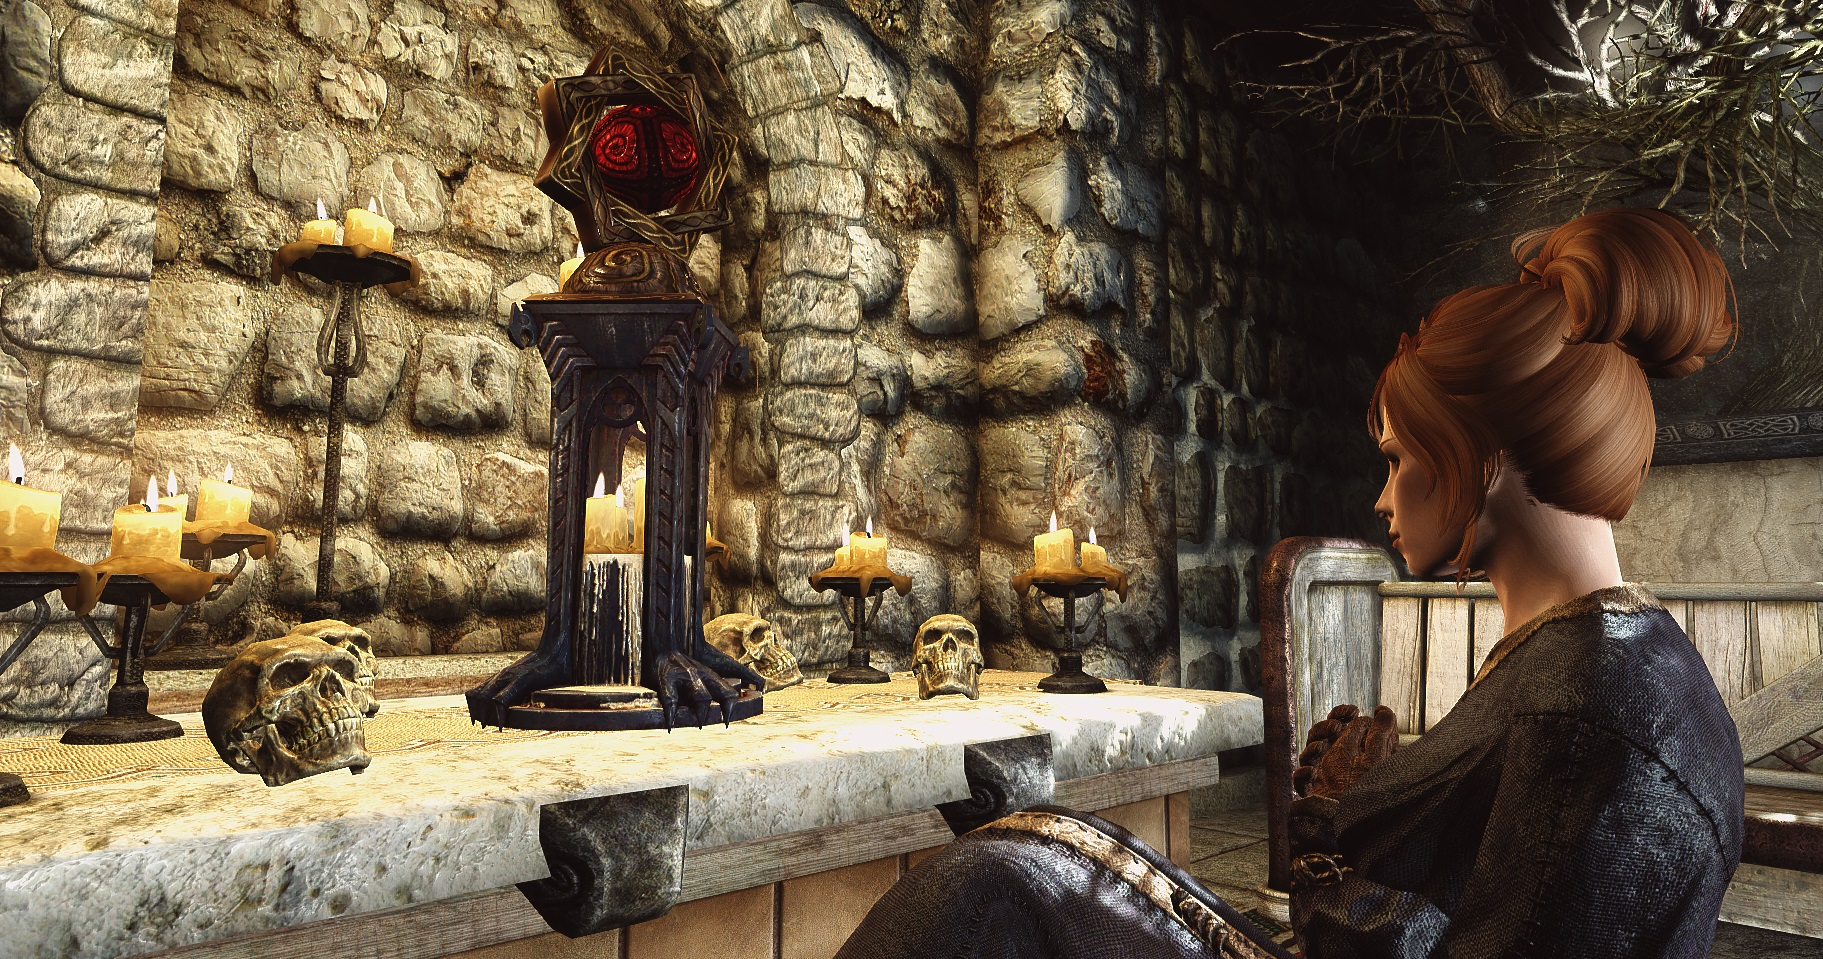 Arkey - Elder Scrolls 5: Skyrim, the